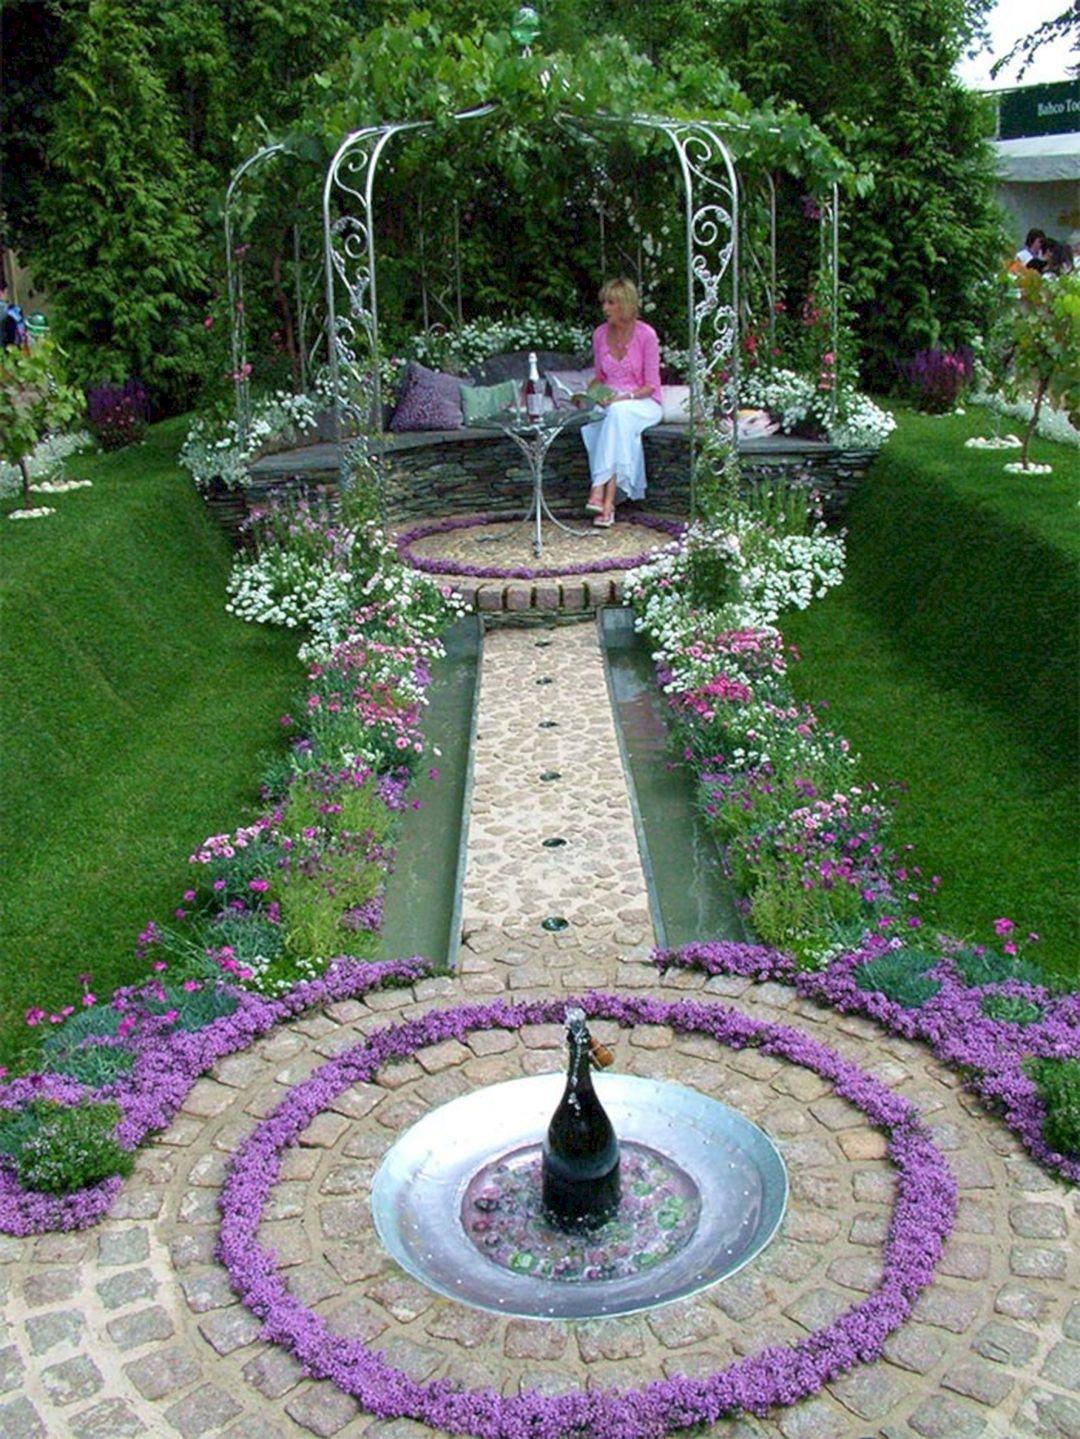 Flower Gardens With Fountains (Flower Gardens With ... on Home Garden Fountain Design id=66143